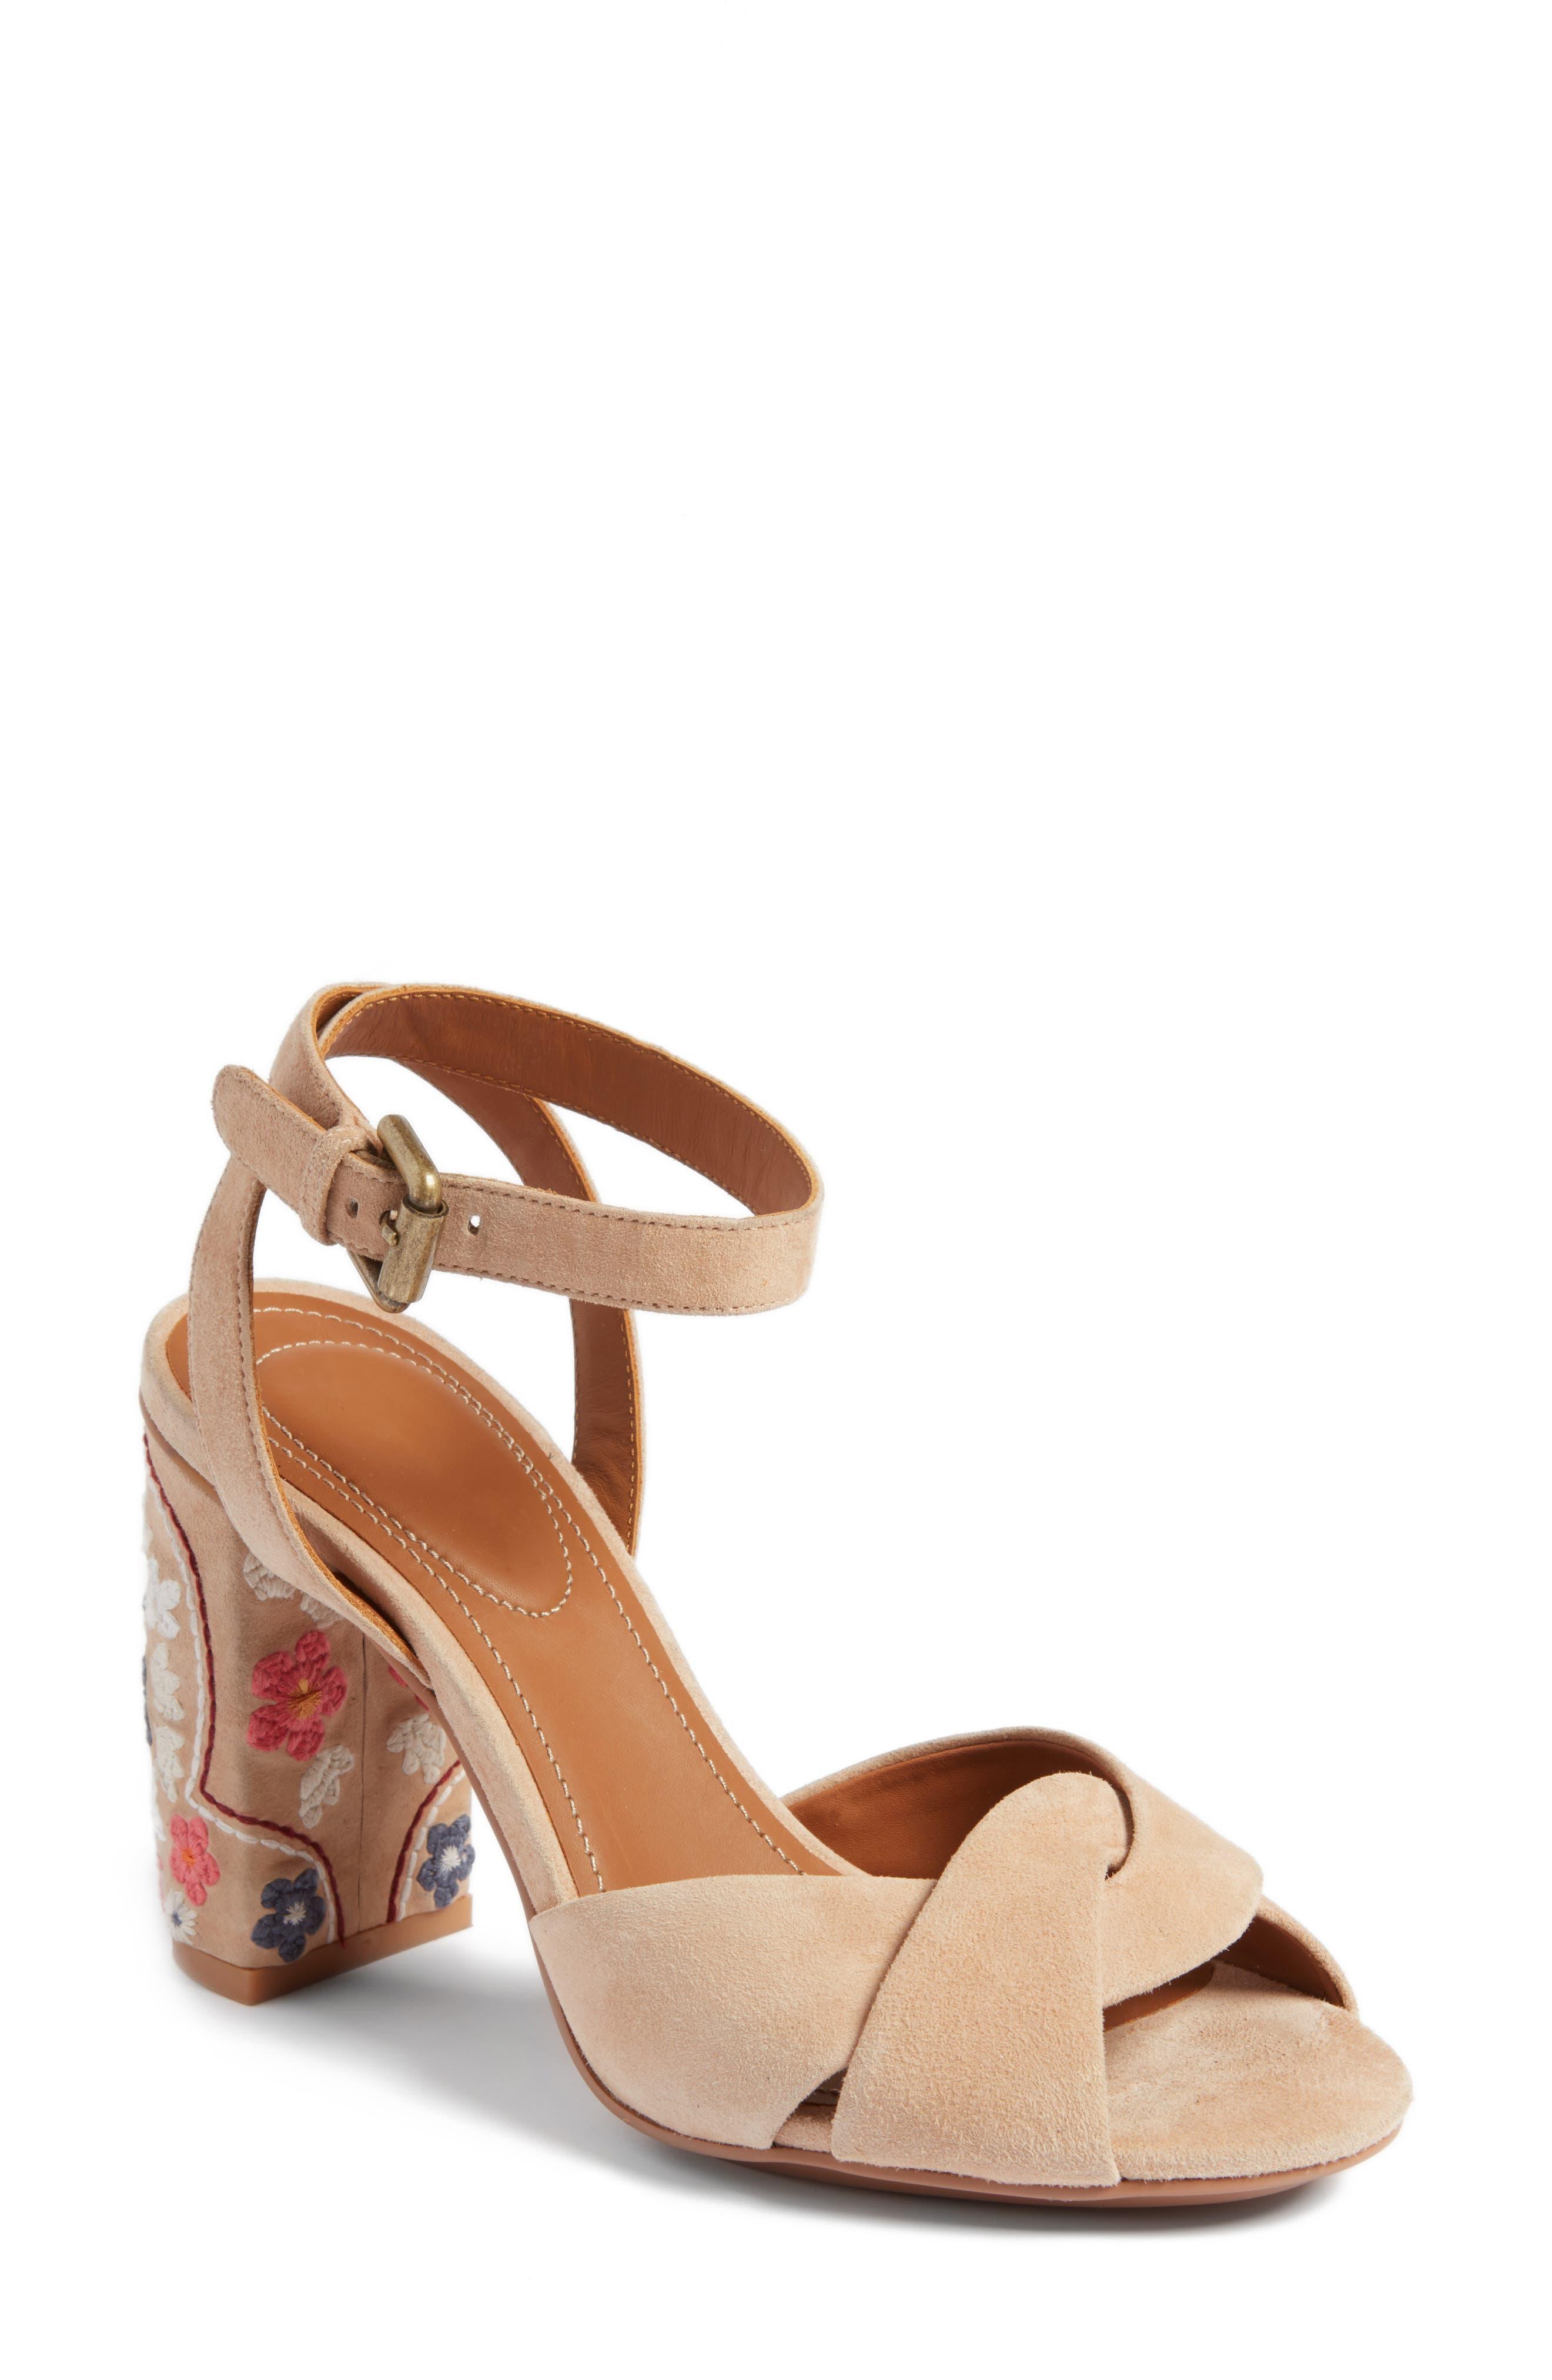 Gayla Embroidered Block Heel Sandal,                         Main,                         color, Nude